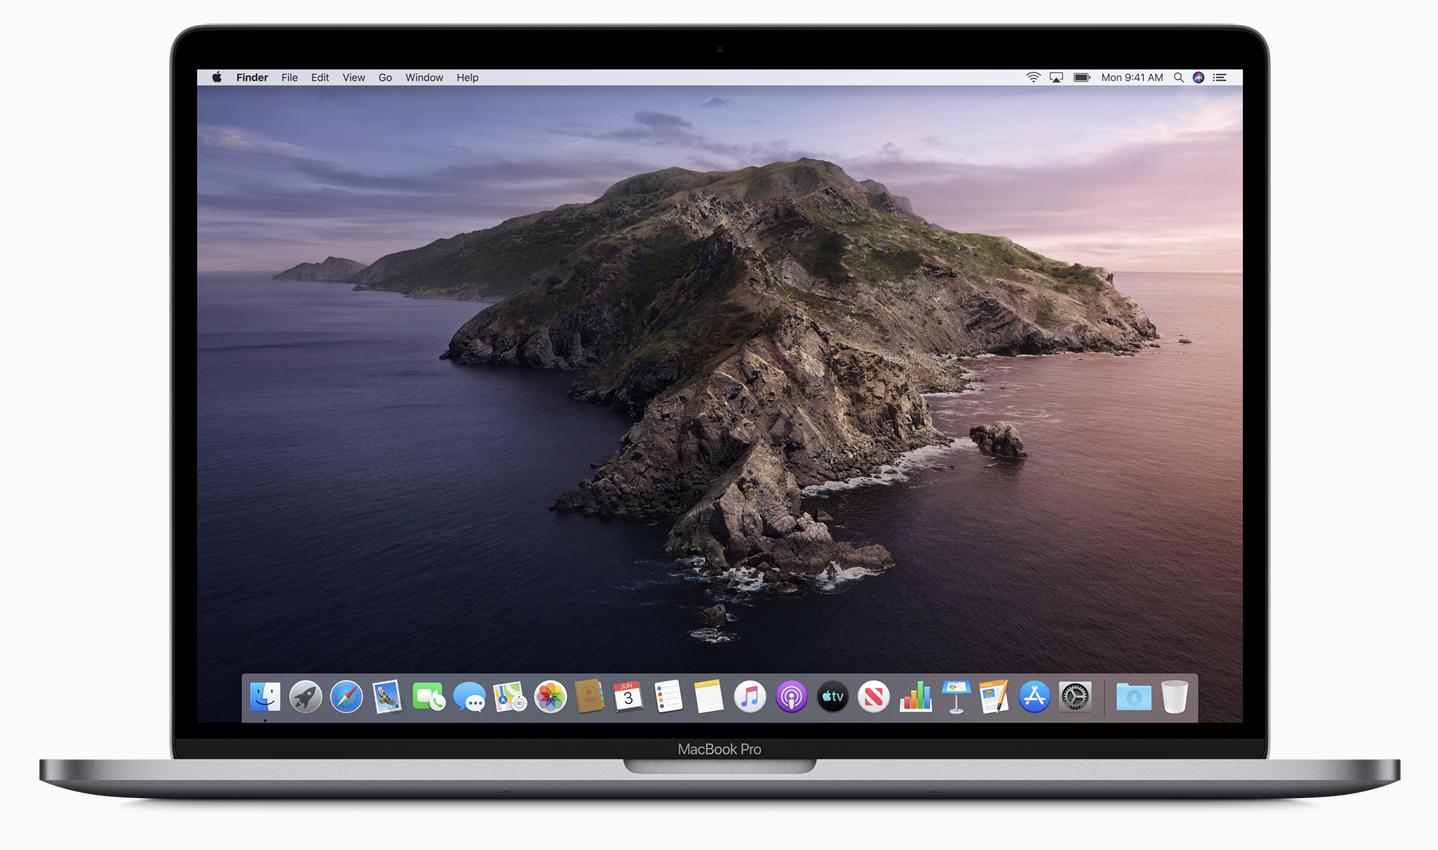 Apple posts third developer beta of macOS Catalina 10.15.2 Update